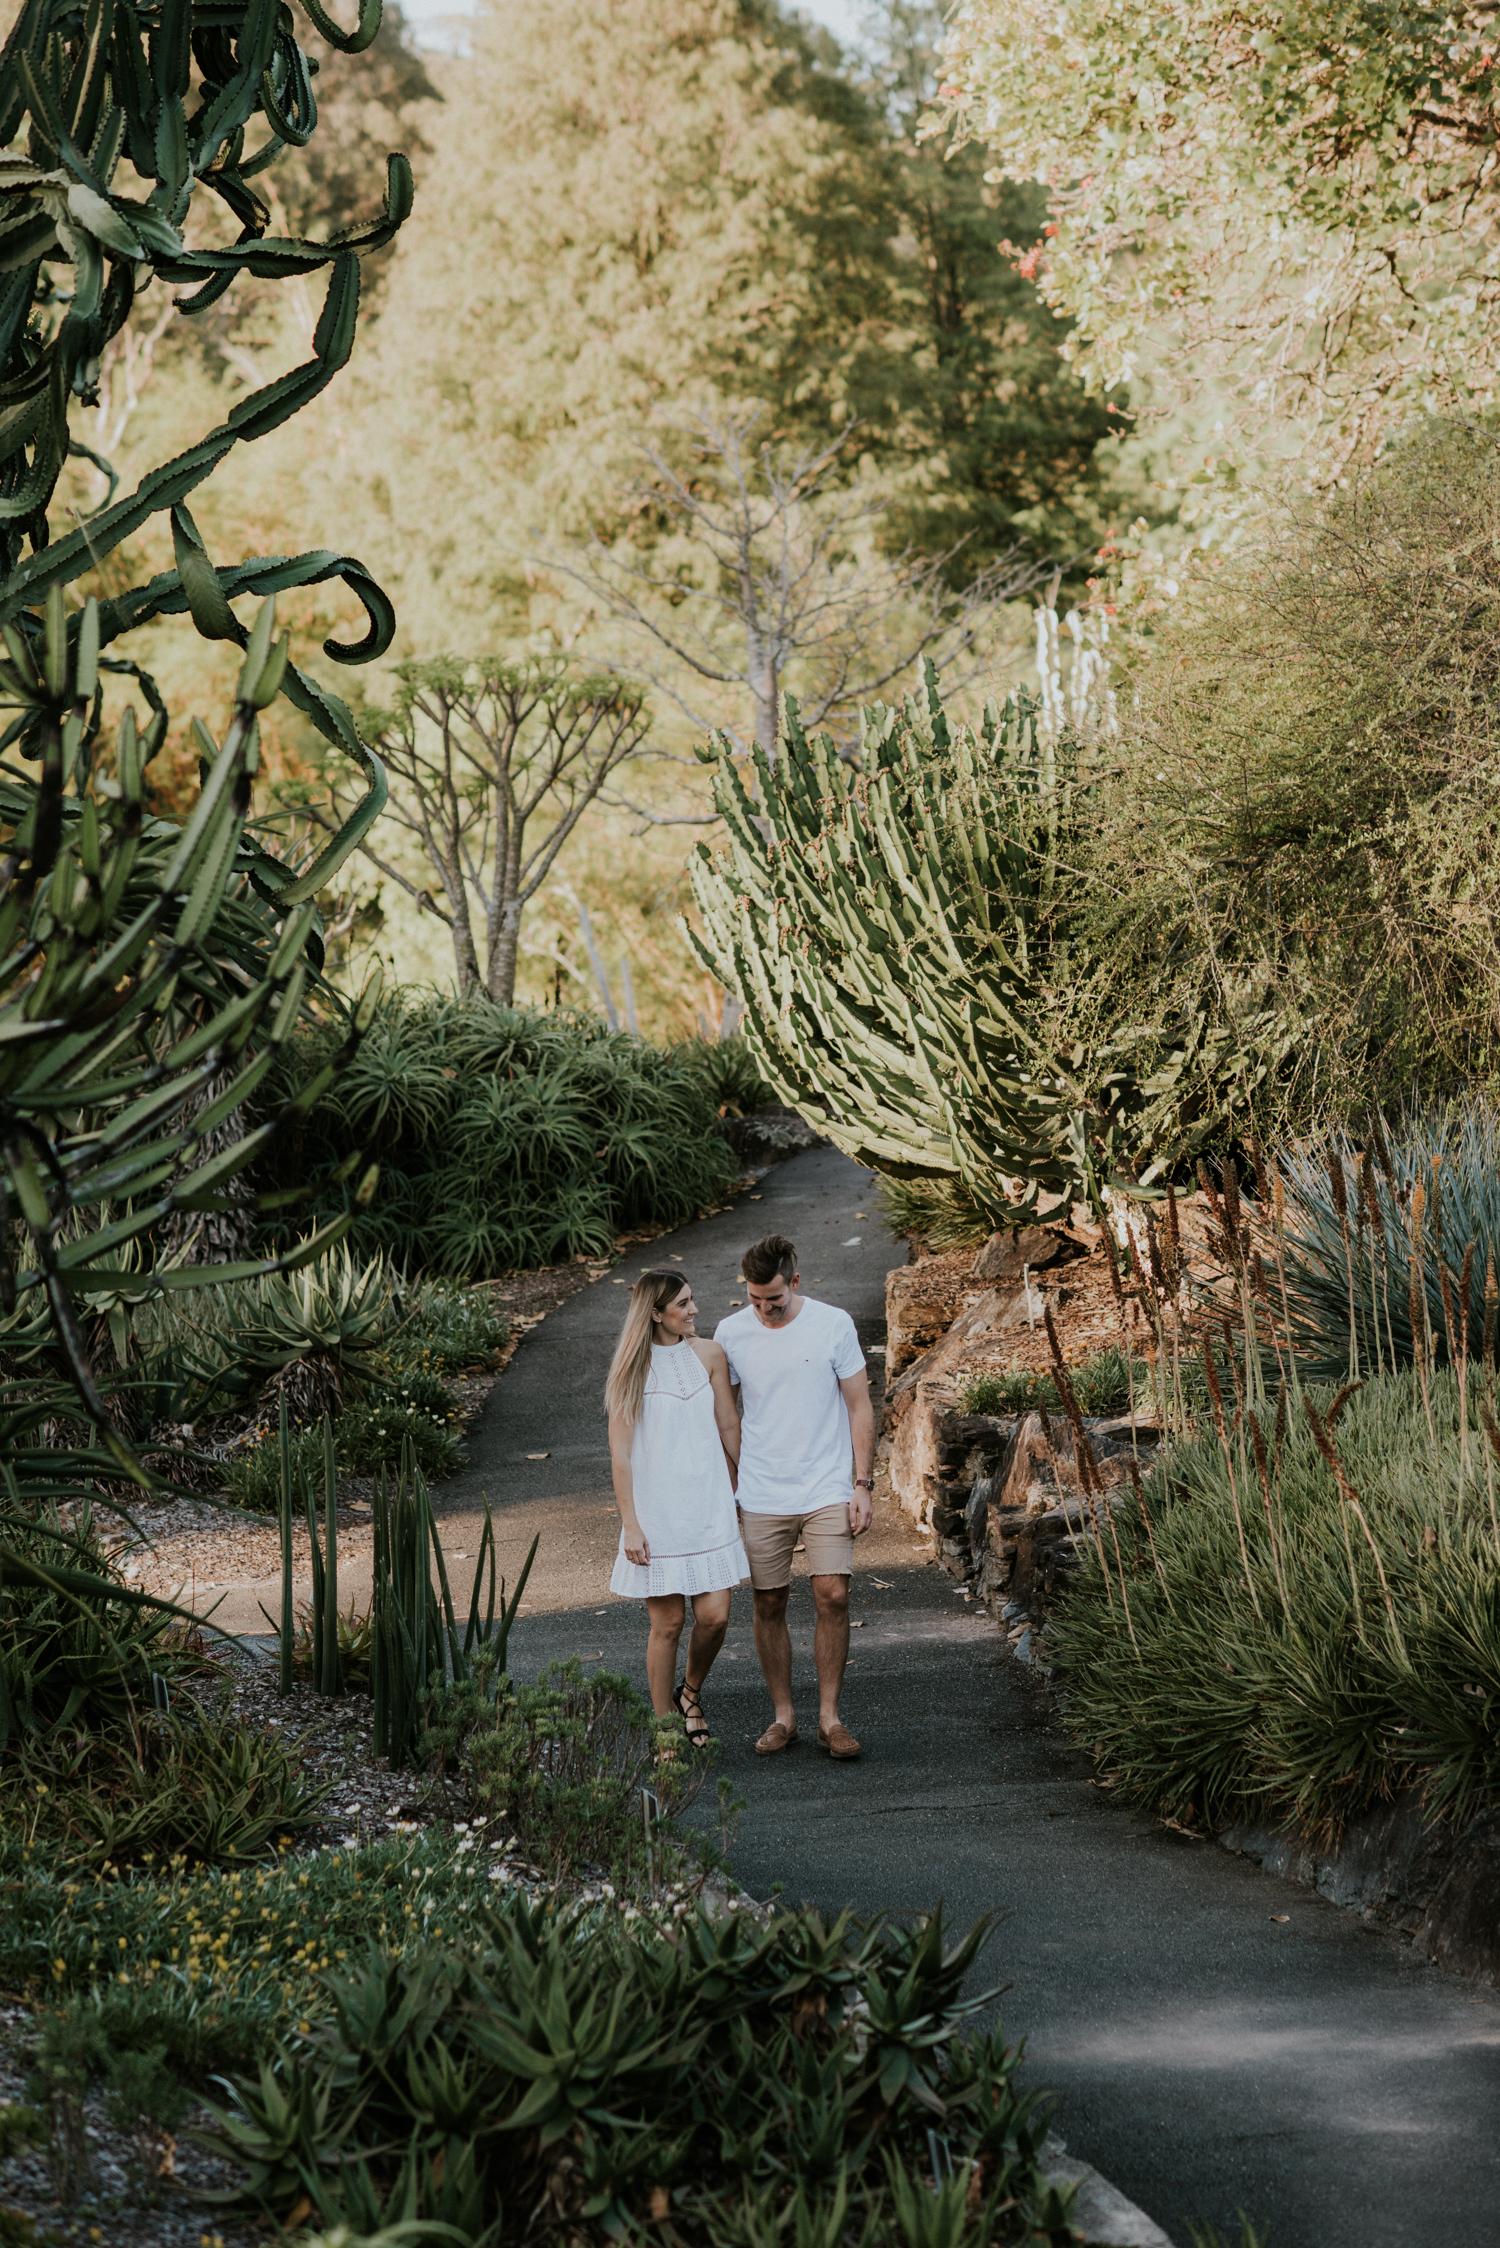 Brisbane Wedding Photographer | Engagement-Elopement Photography Botanical Gardens-17.jpg